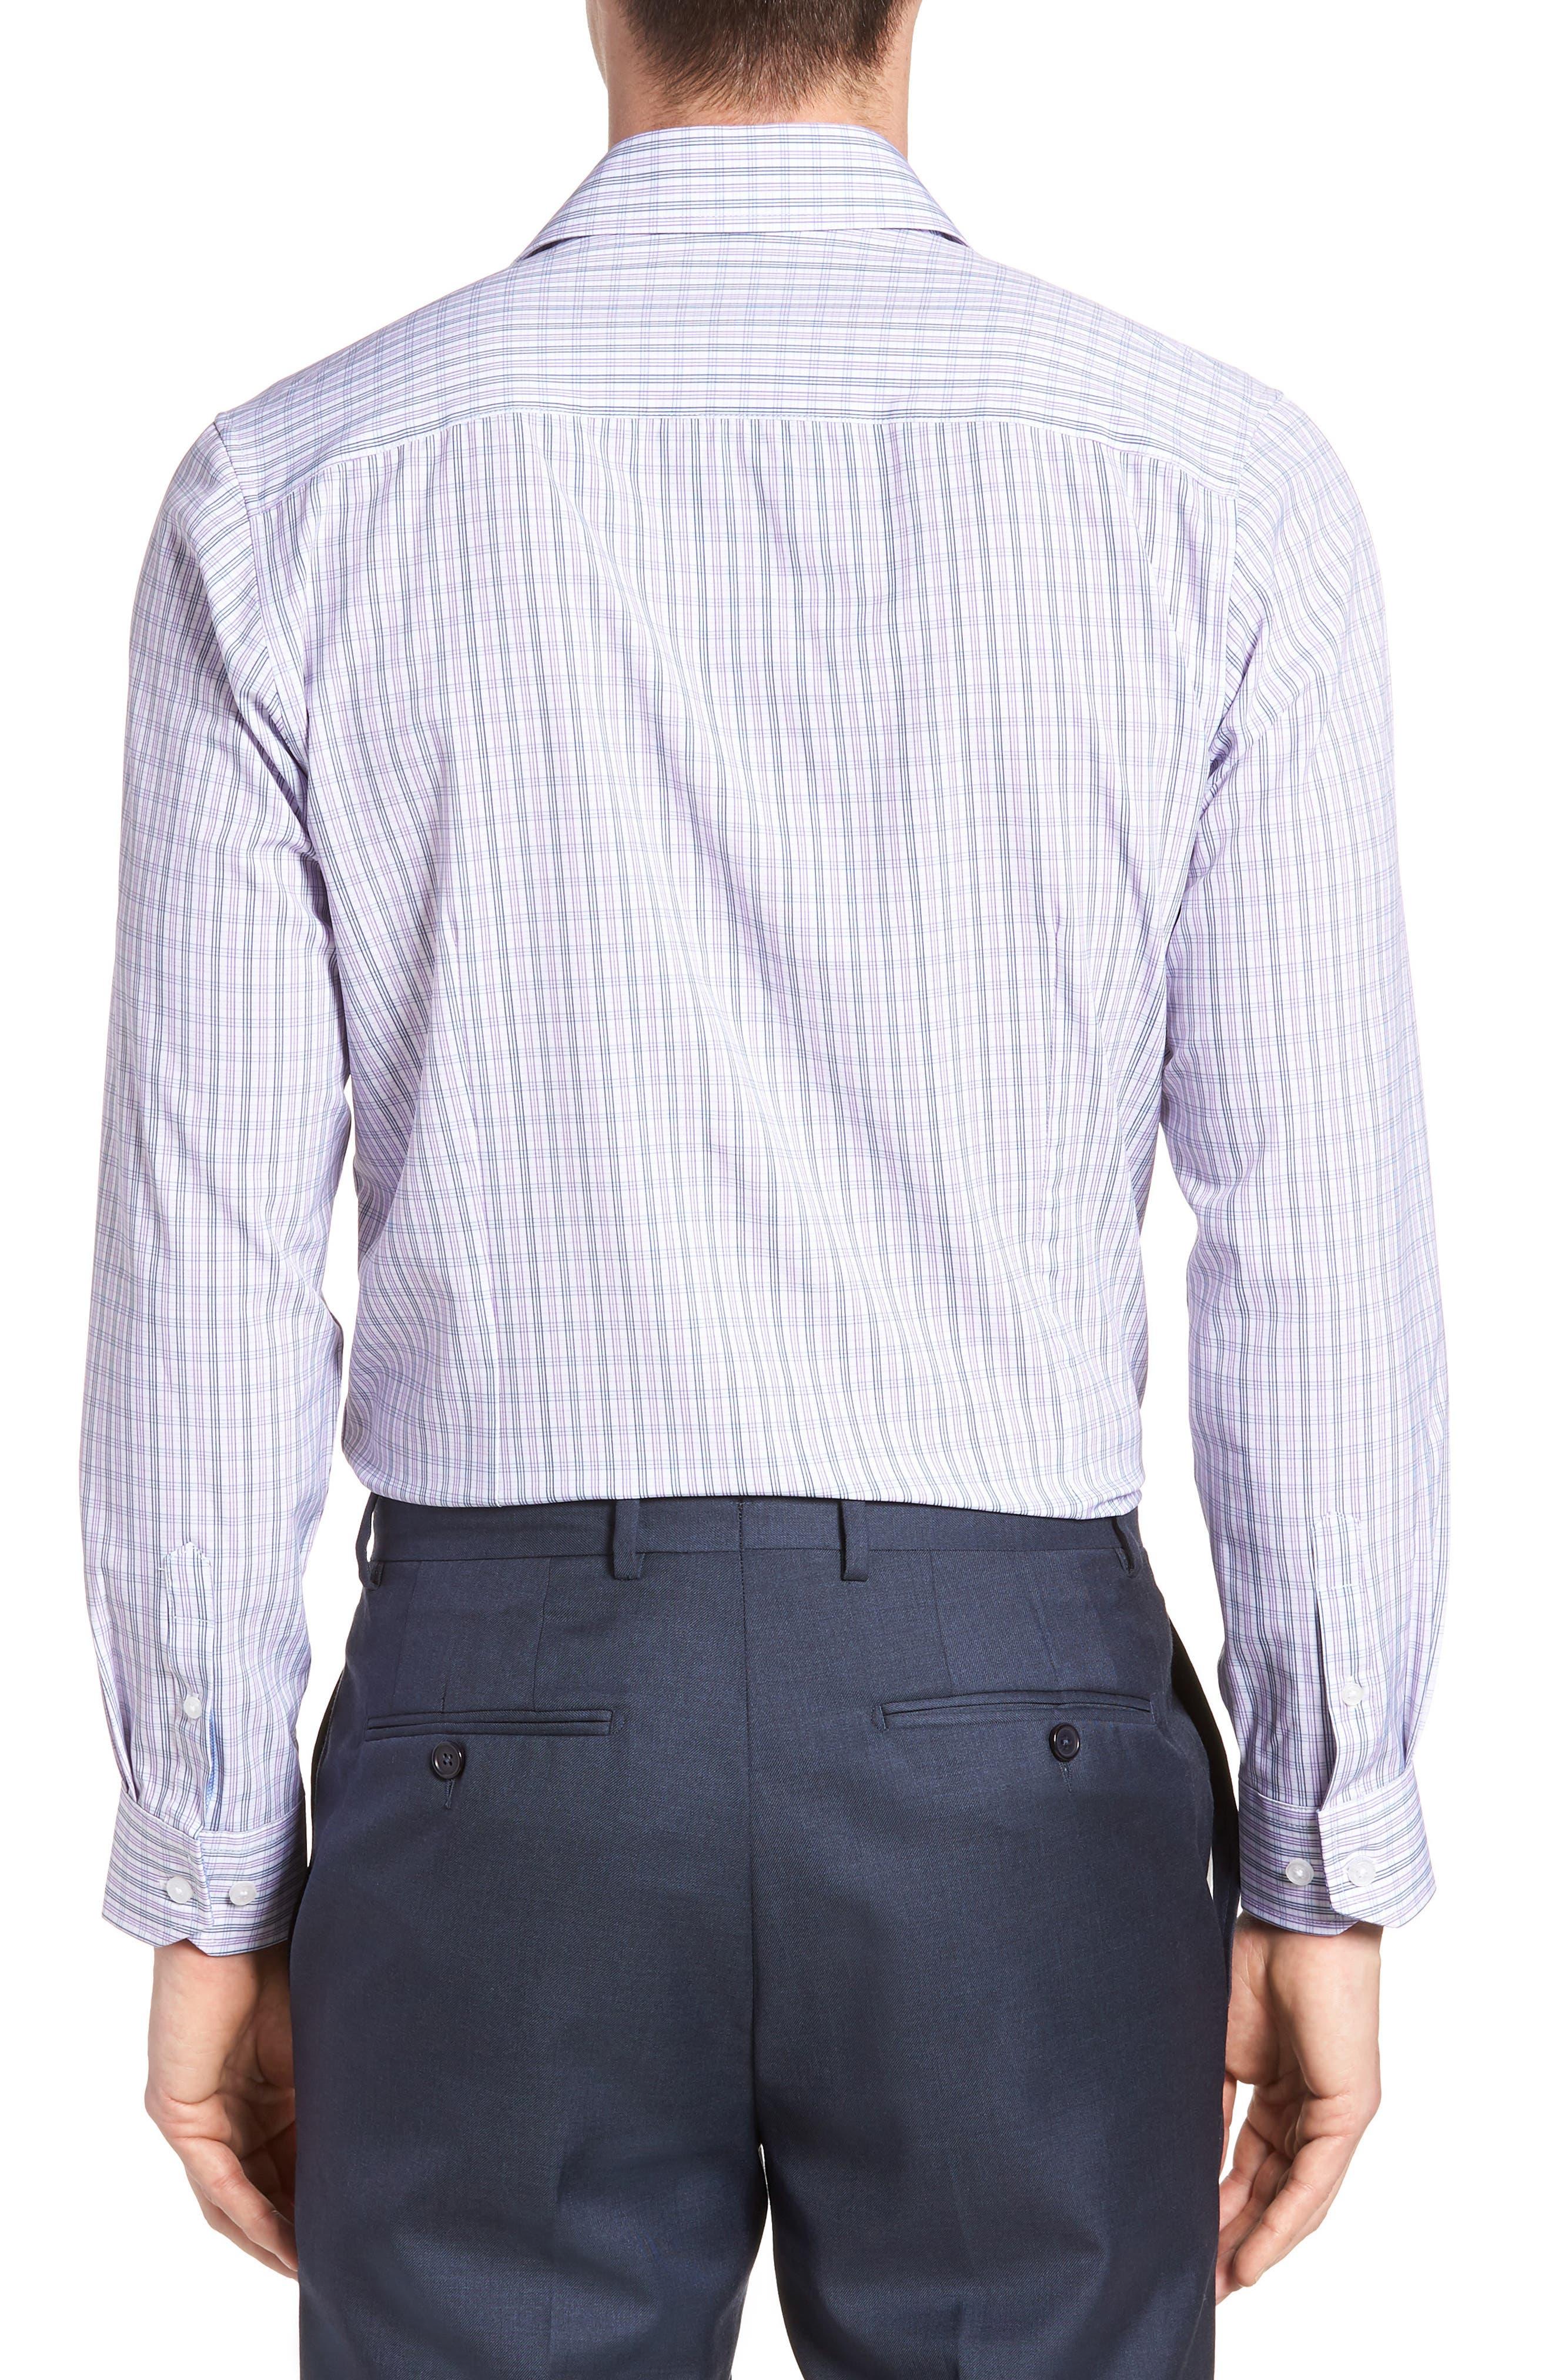 Trim Fit Check 4-Way Stretch Dress Shirt,                             Alternate thumbnail 3, color,                             PURPLE